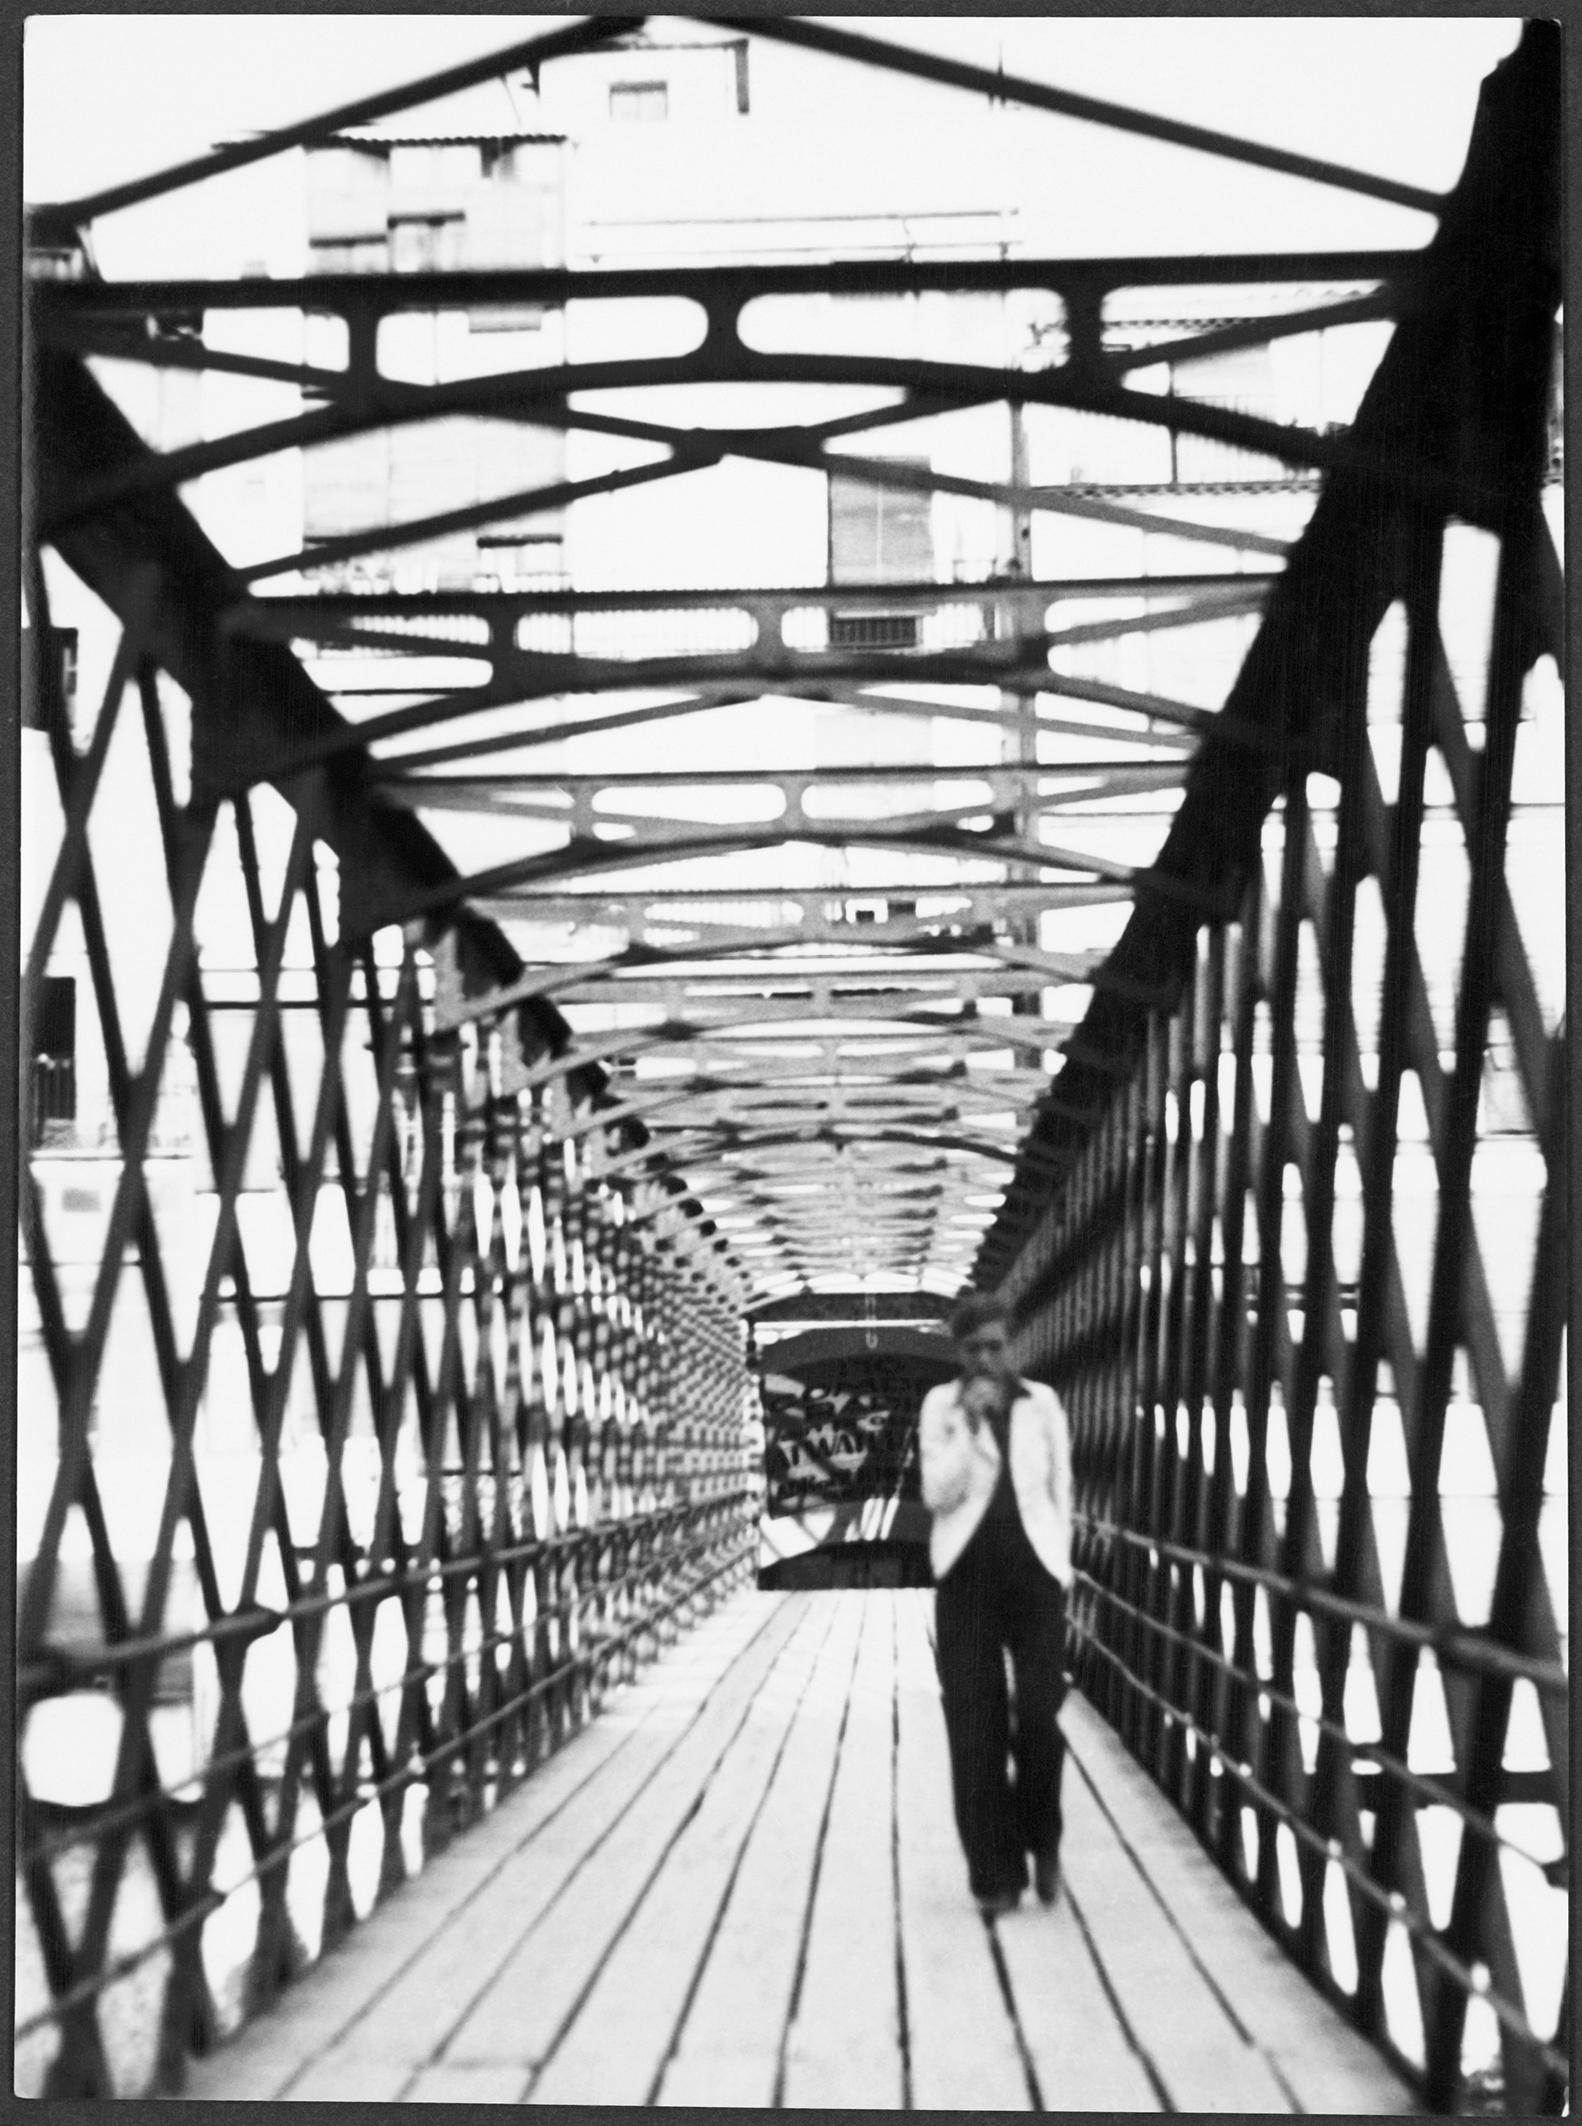 12-_mariane_breslauer_sense_titol_annemarie_schwarzenbach_travessant_el_pont_eiffel_sobre_el_riu_onar_girona_1933-_schweizeriche_nationalbibliotheknb_bern